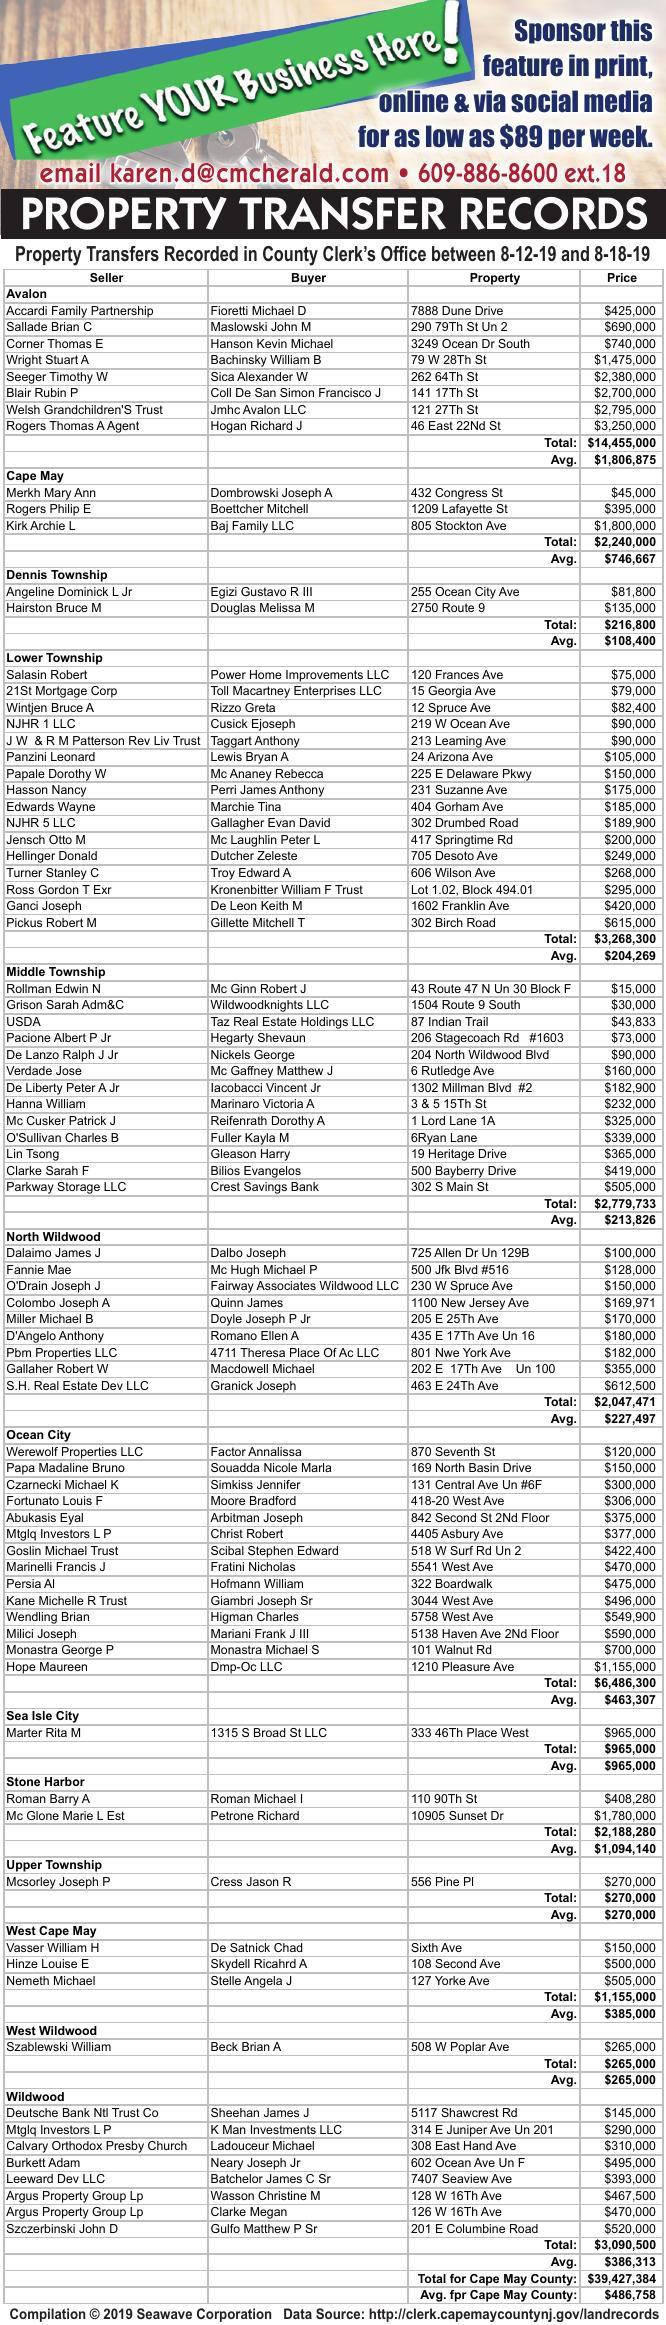 Property Transfer Records 8/12/19-8/18/19